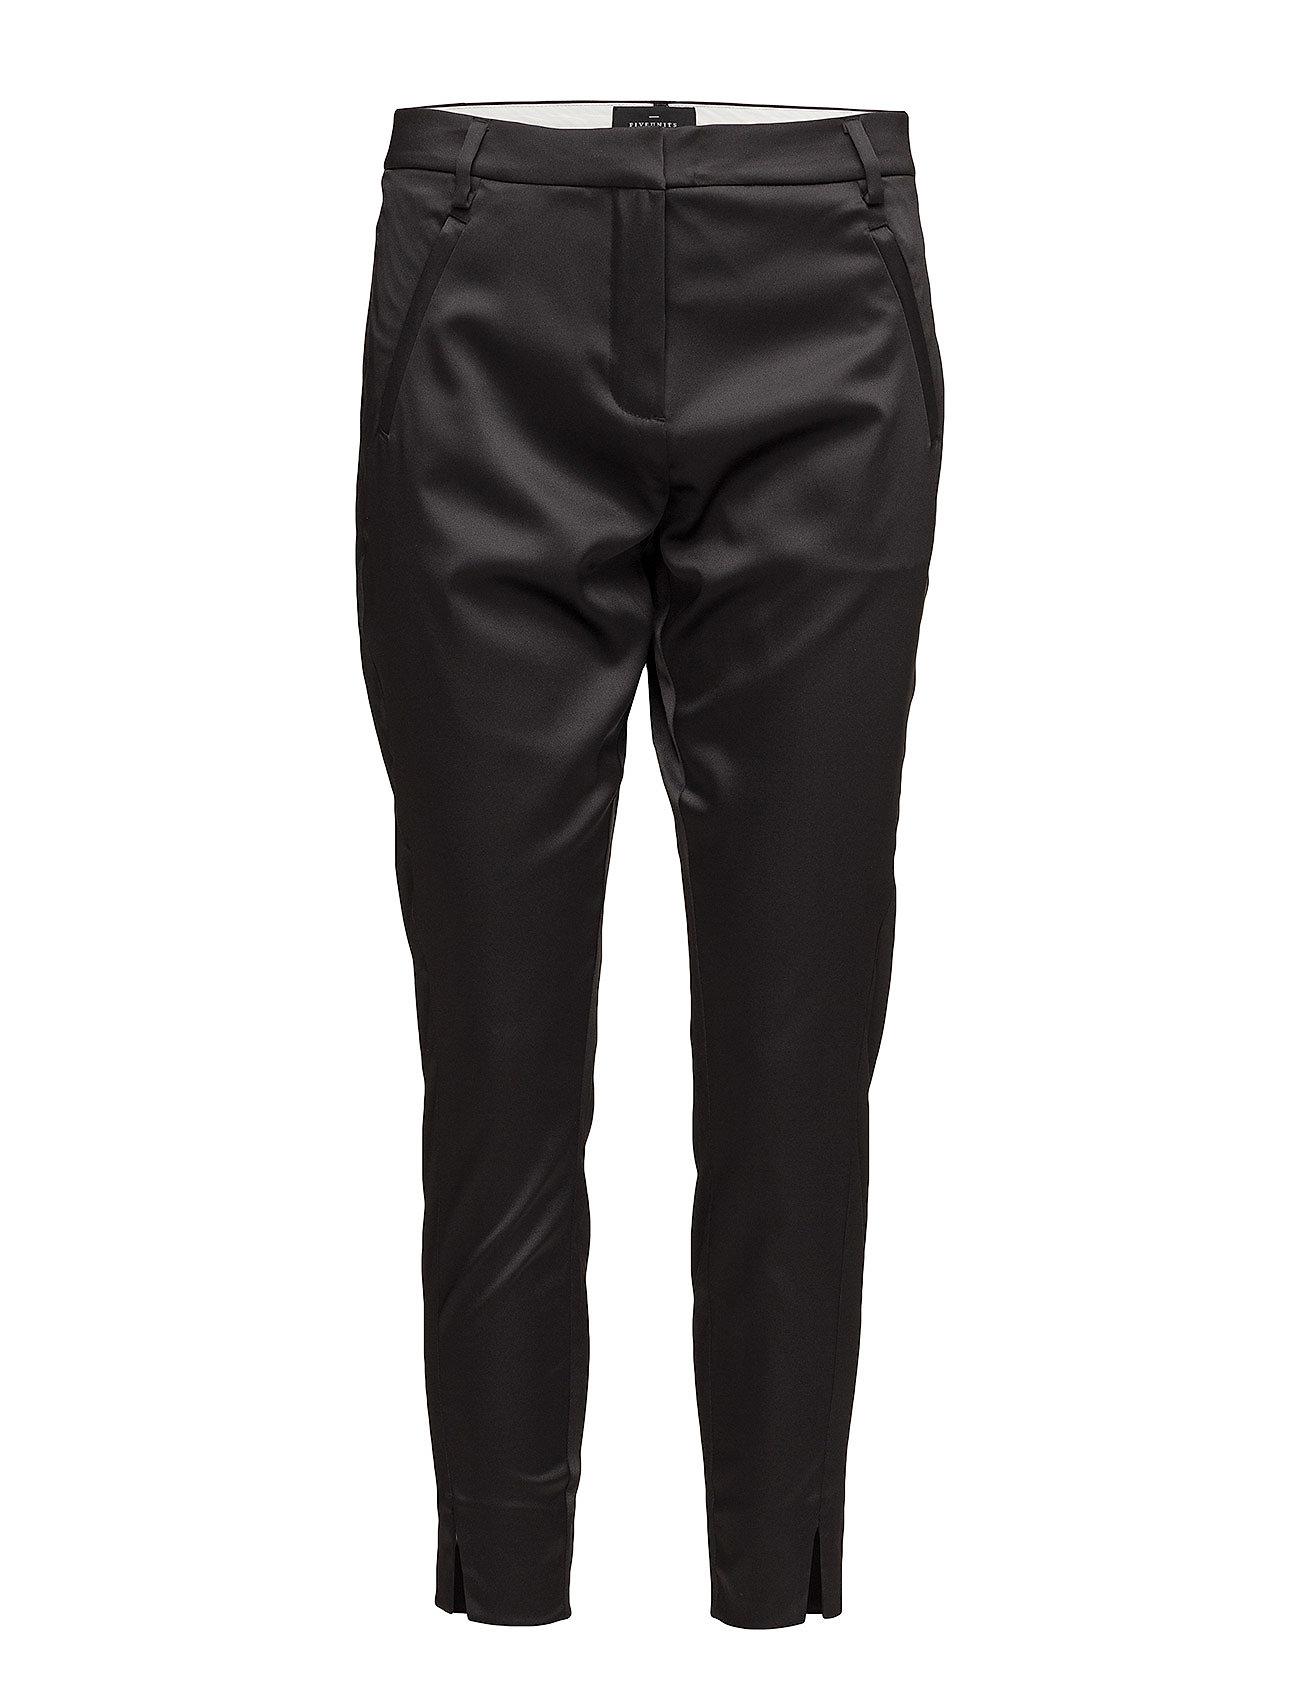 Angelie 696 Split, Black Shine, Pants